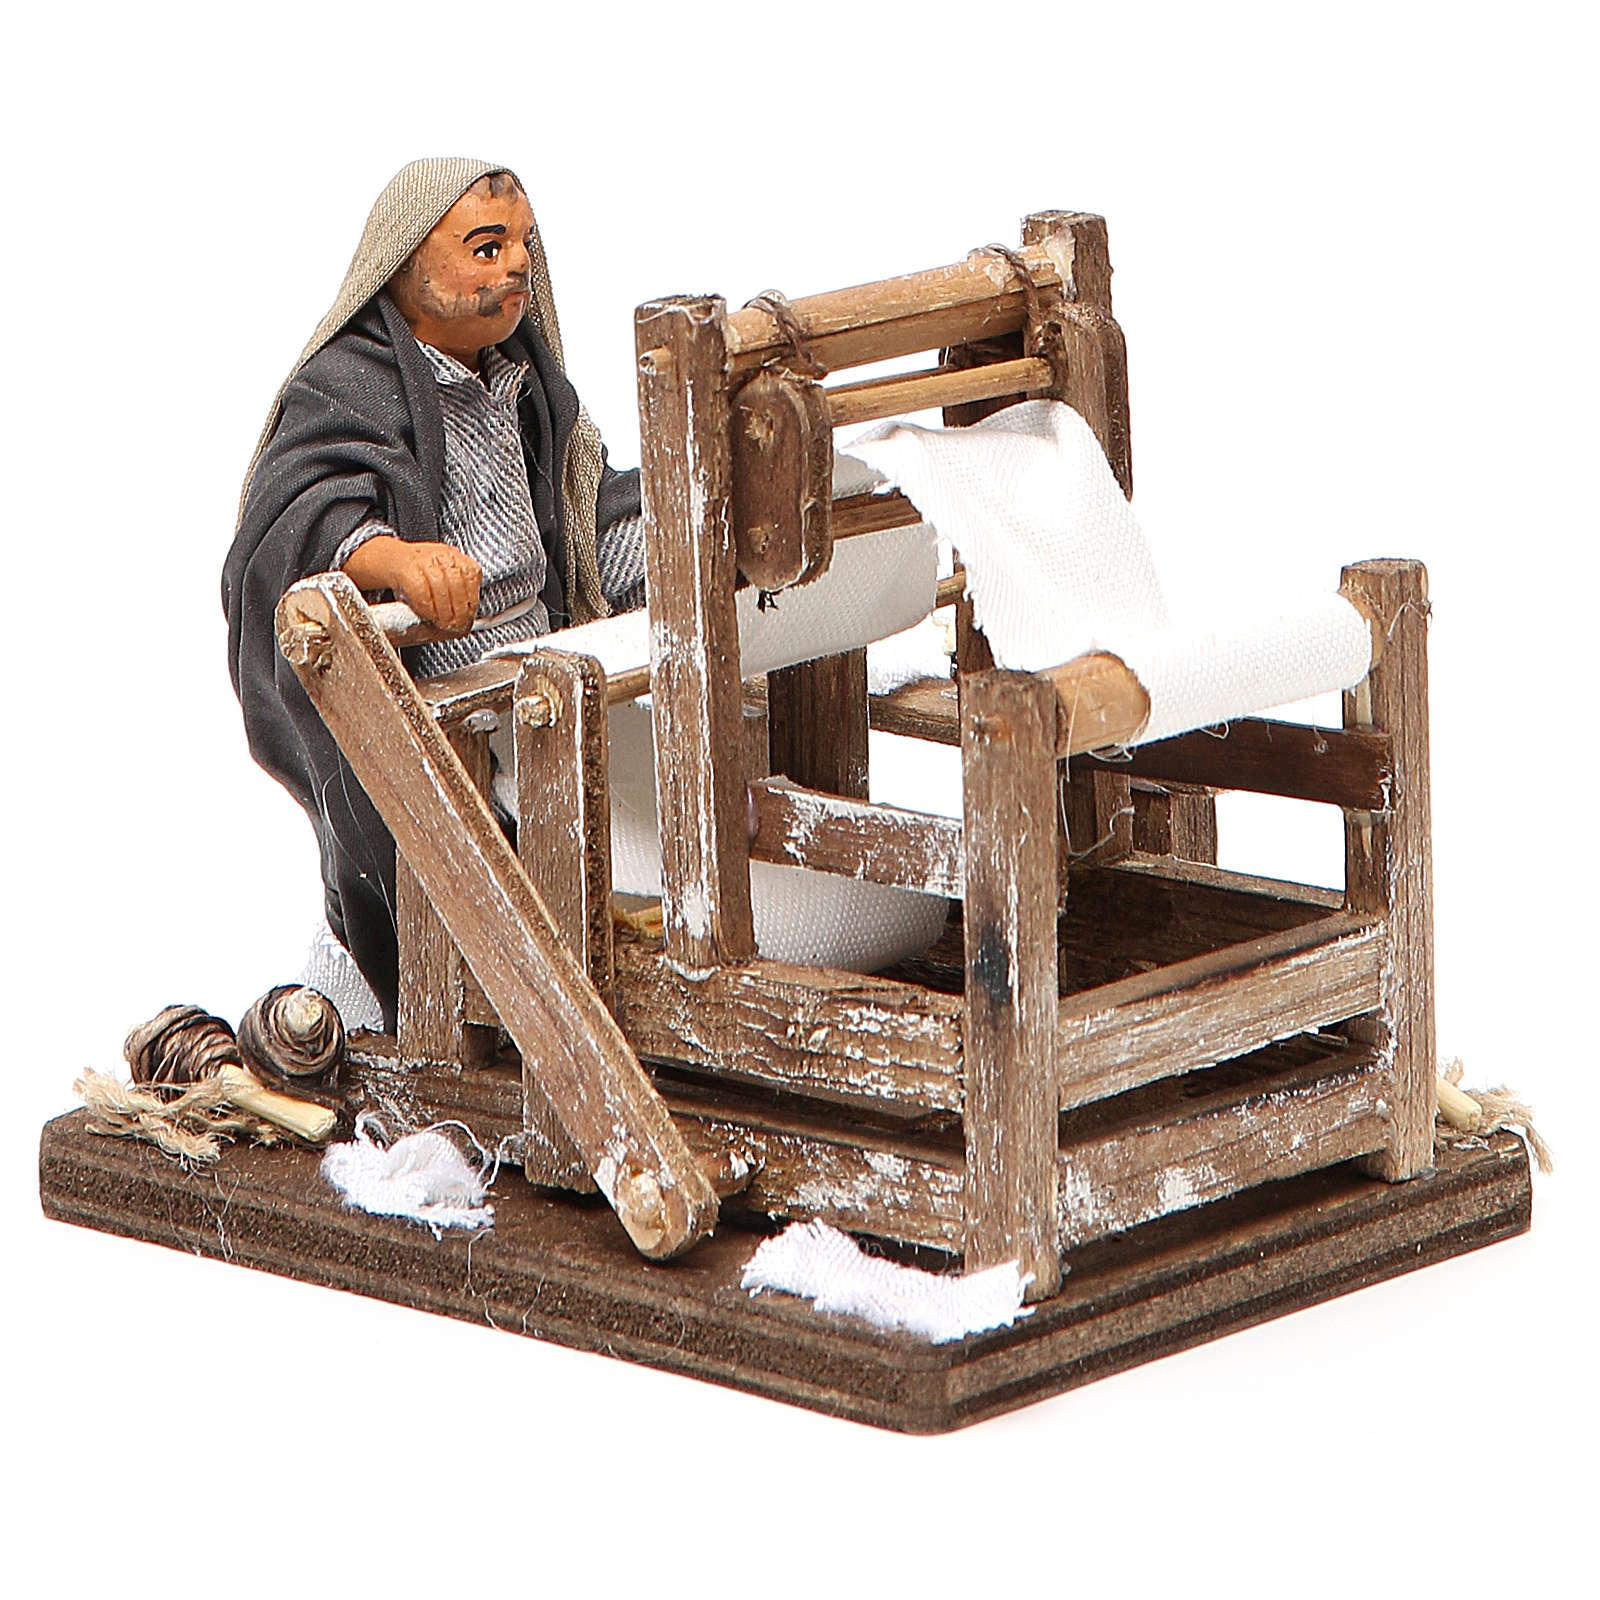 Man with loom, Neapolitan nativity figurine 10cm 4